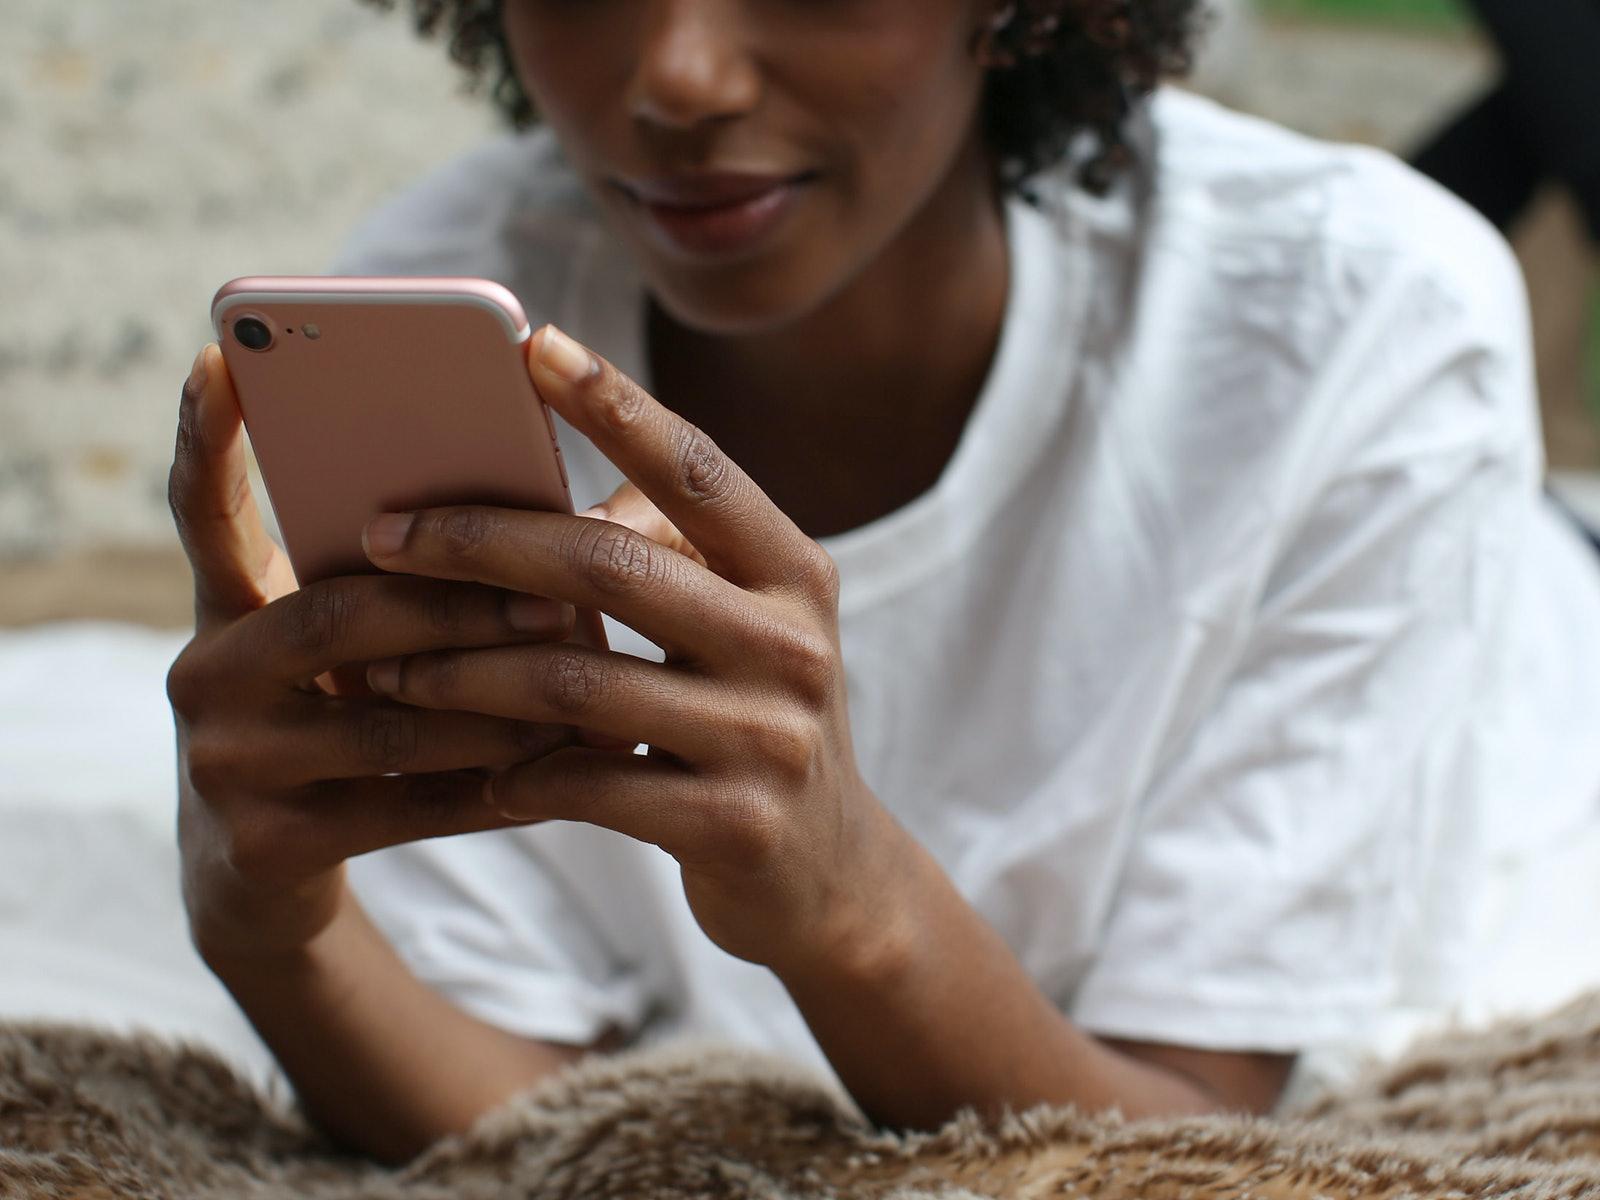 Ca01 online dating